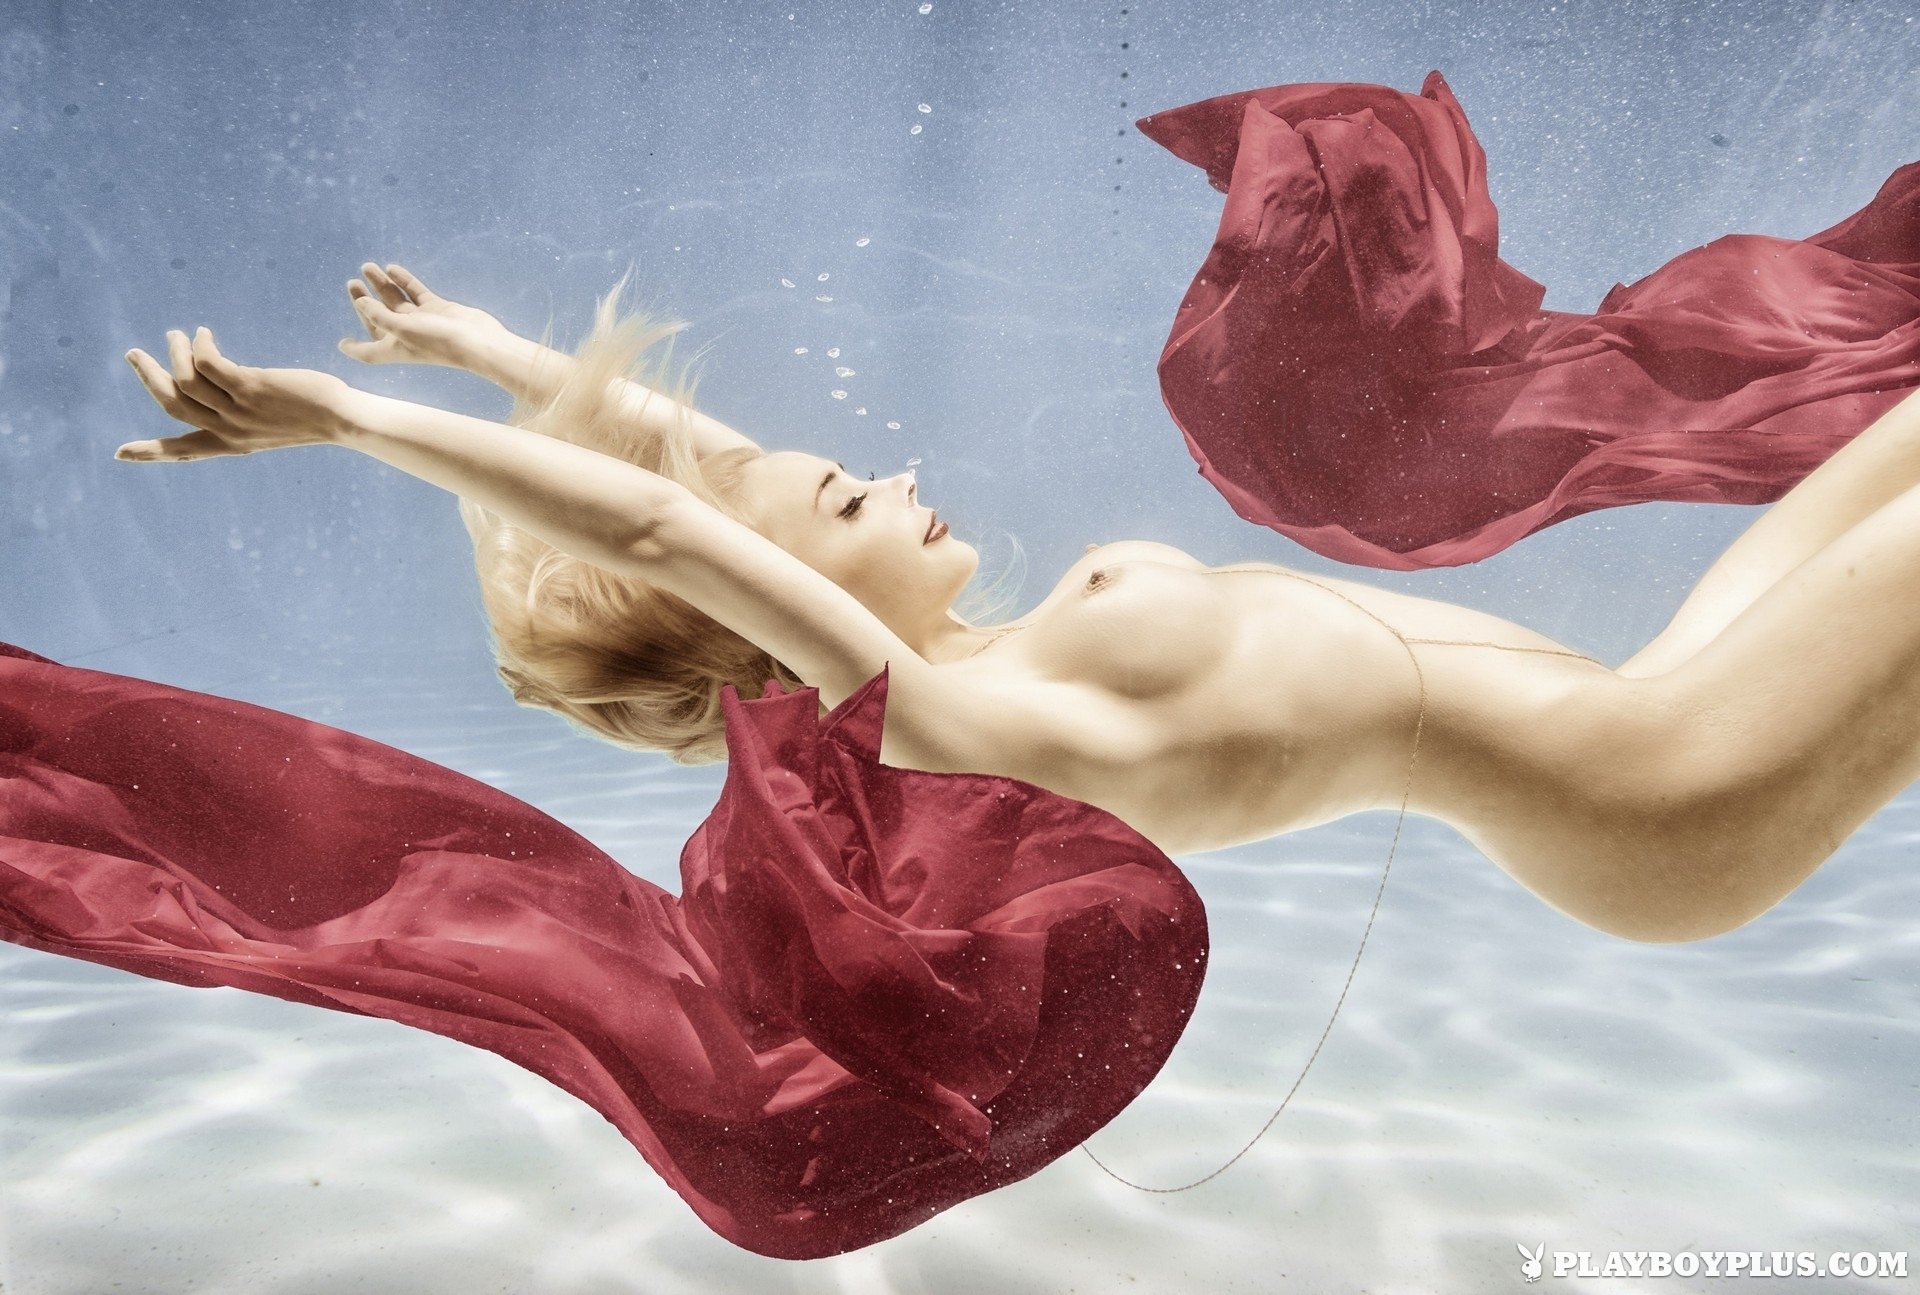 amber-bassick-blonde-nude-underwater-playboy-13